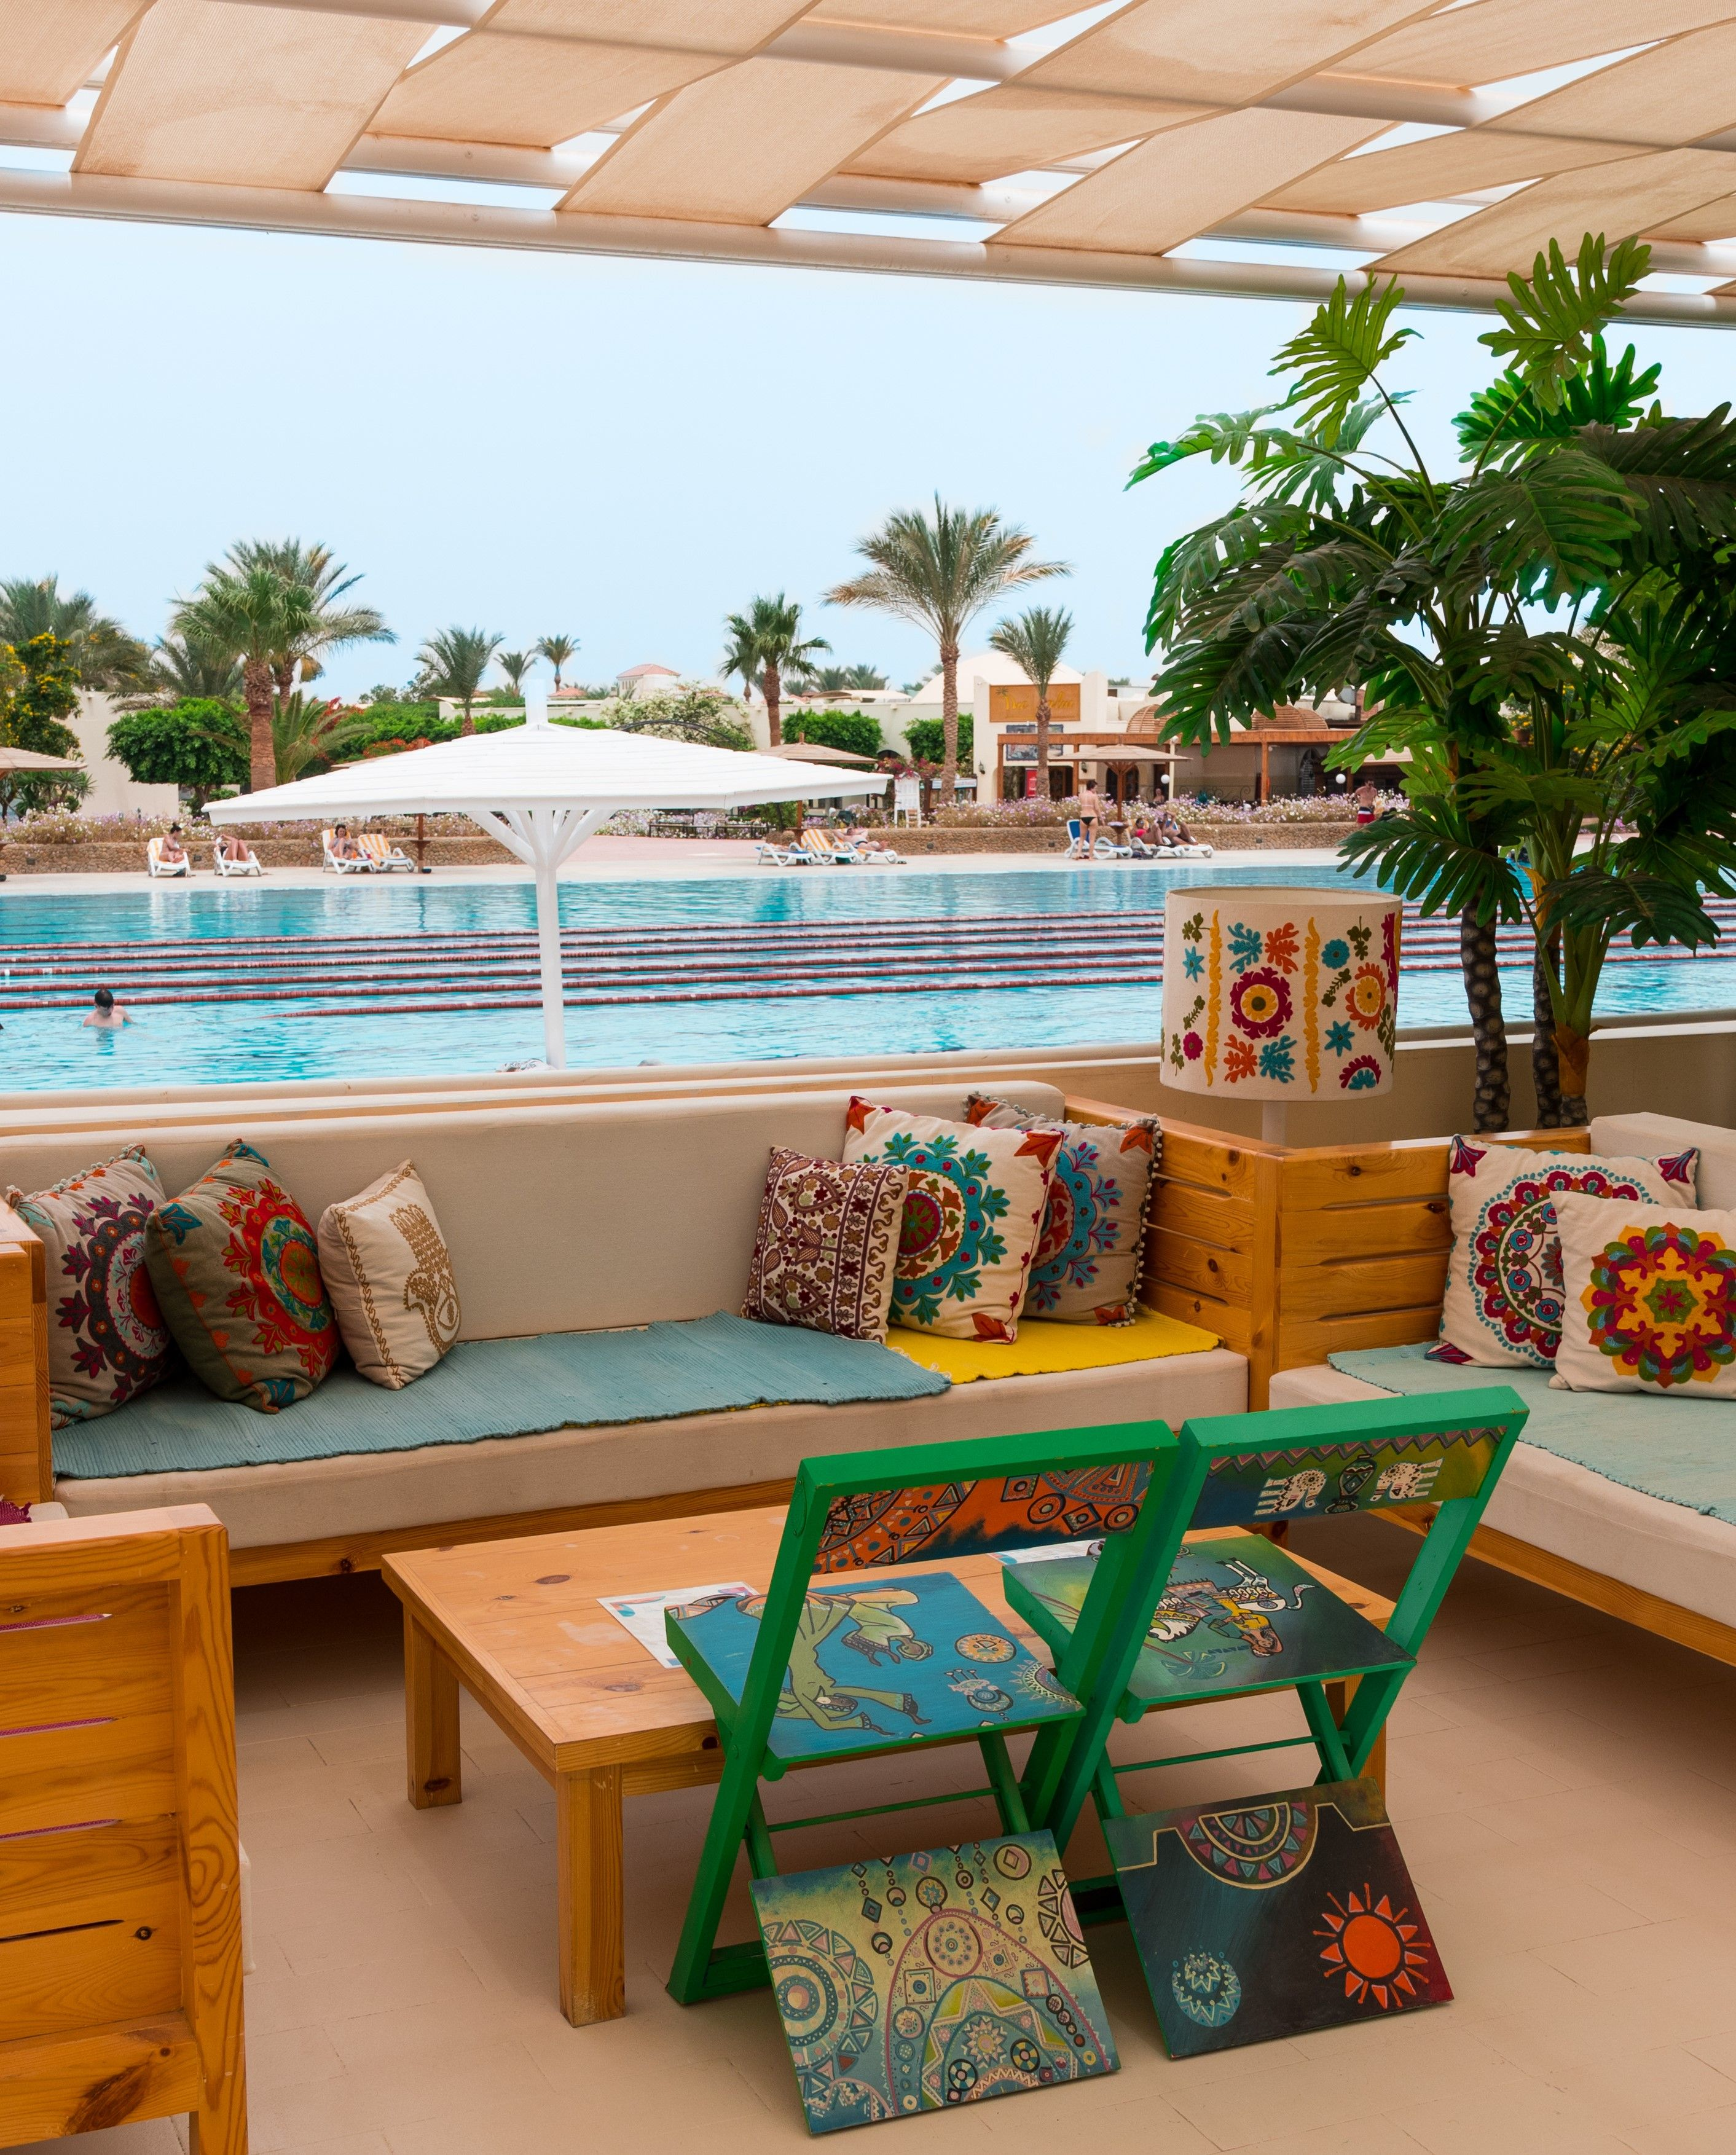 Desert Rose Hurghada Hotels Hotel Tipps Am Moten Meer Agypten Urlaub